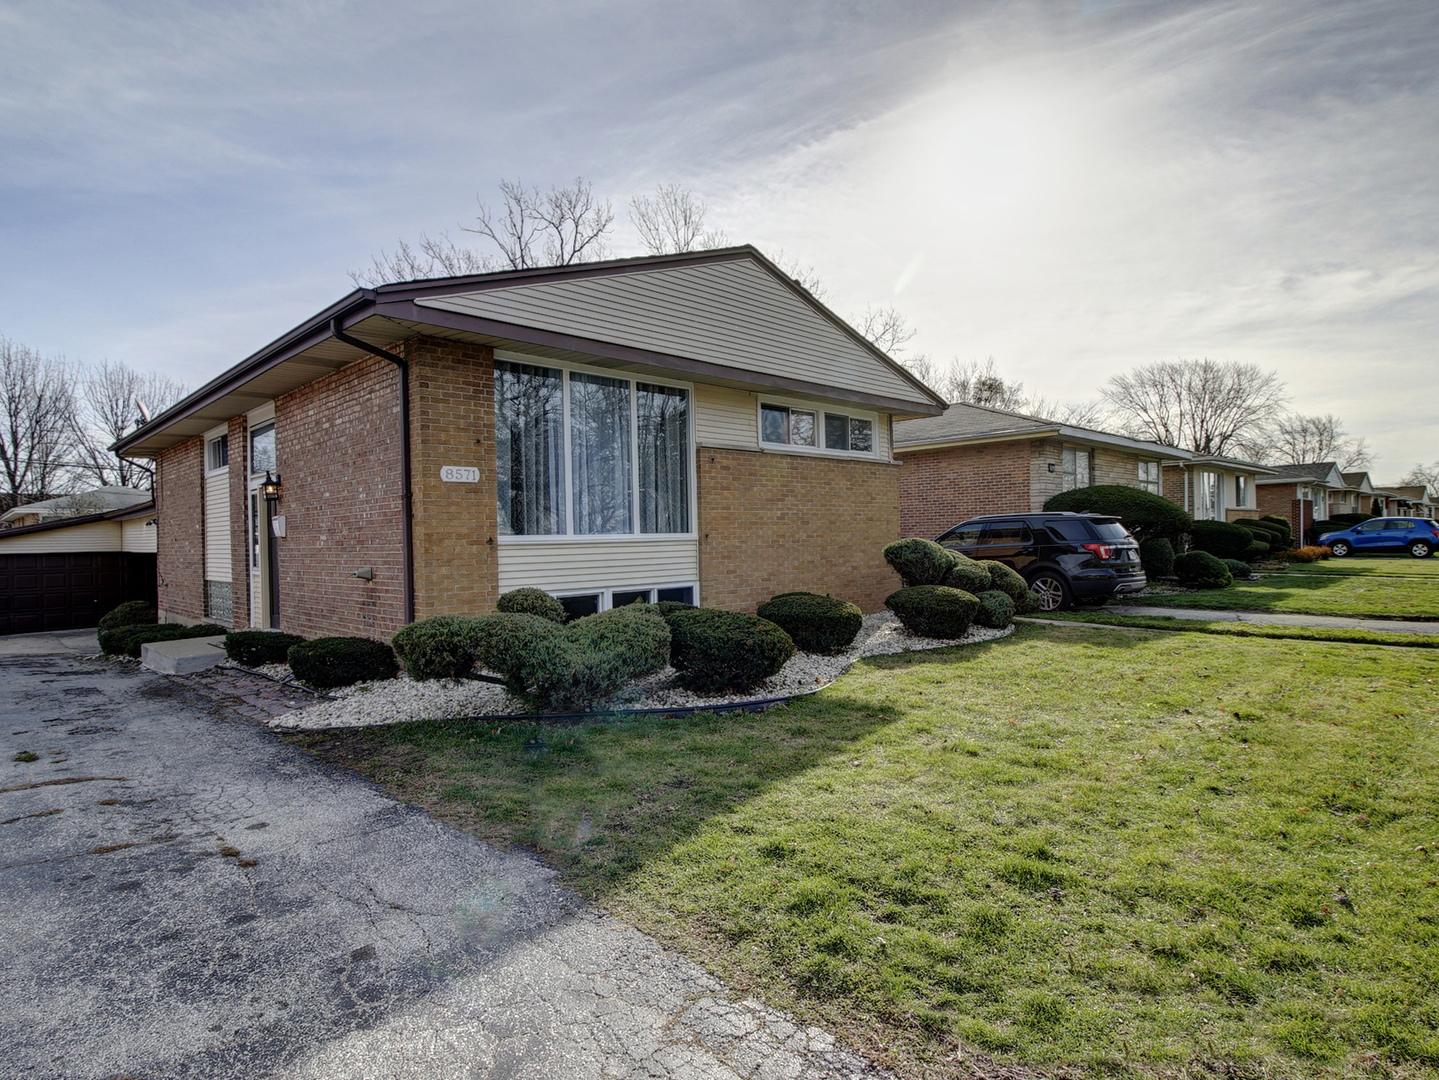 8571 S Kenwood Exterior Photo